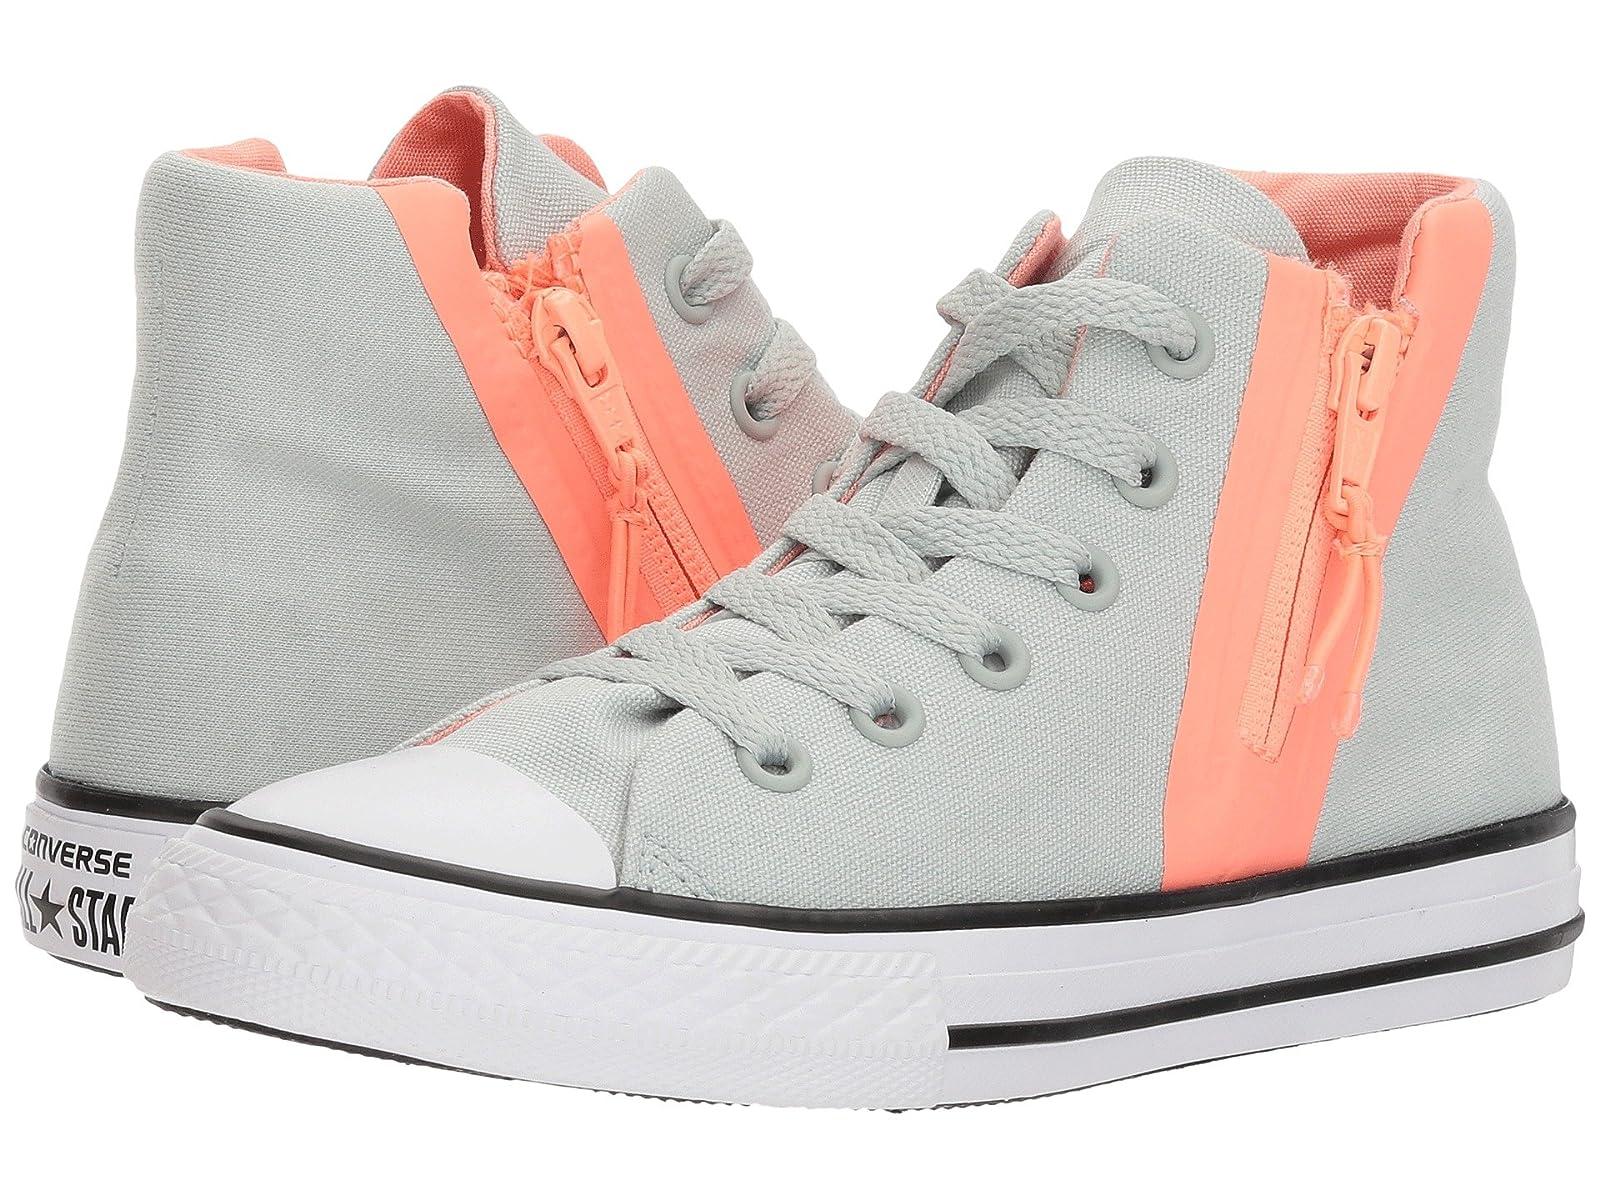 Converse Kids Chuck Taylor All Star Sport Zip Hi (Little Kid/Big Kid)Atmospheric grades have affordable shoes